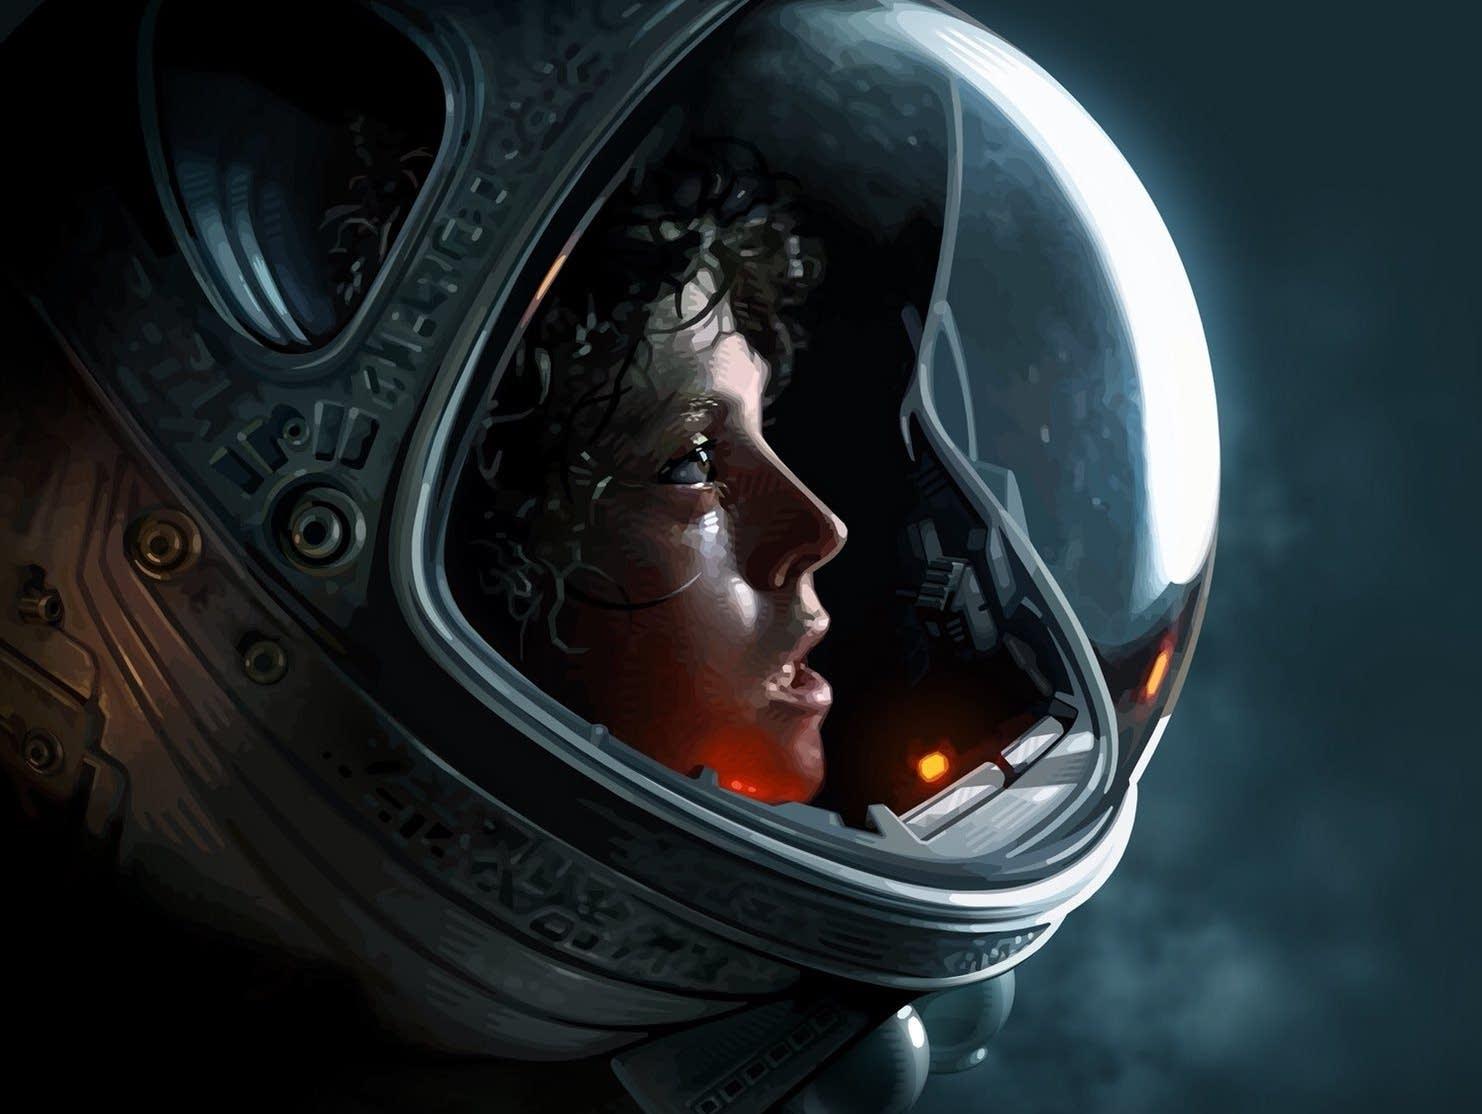 Sigourney Weaver stars in the 1979 film 'Alien.'